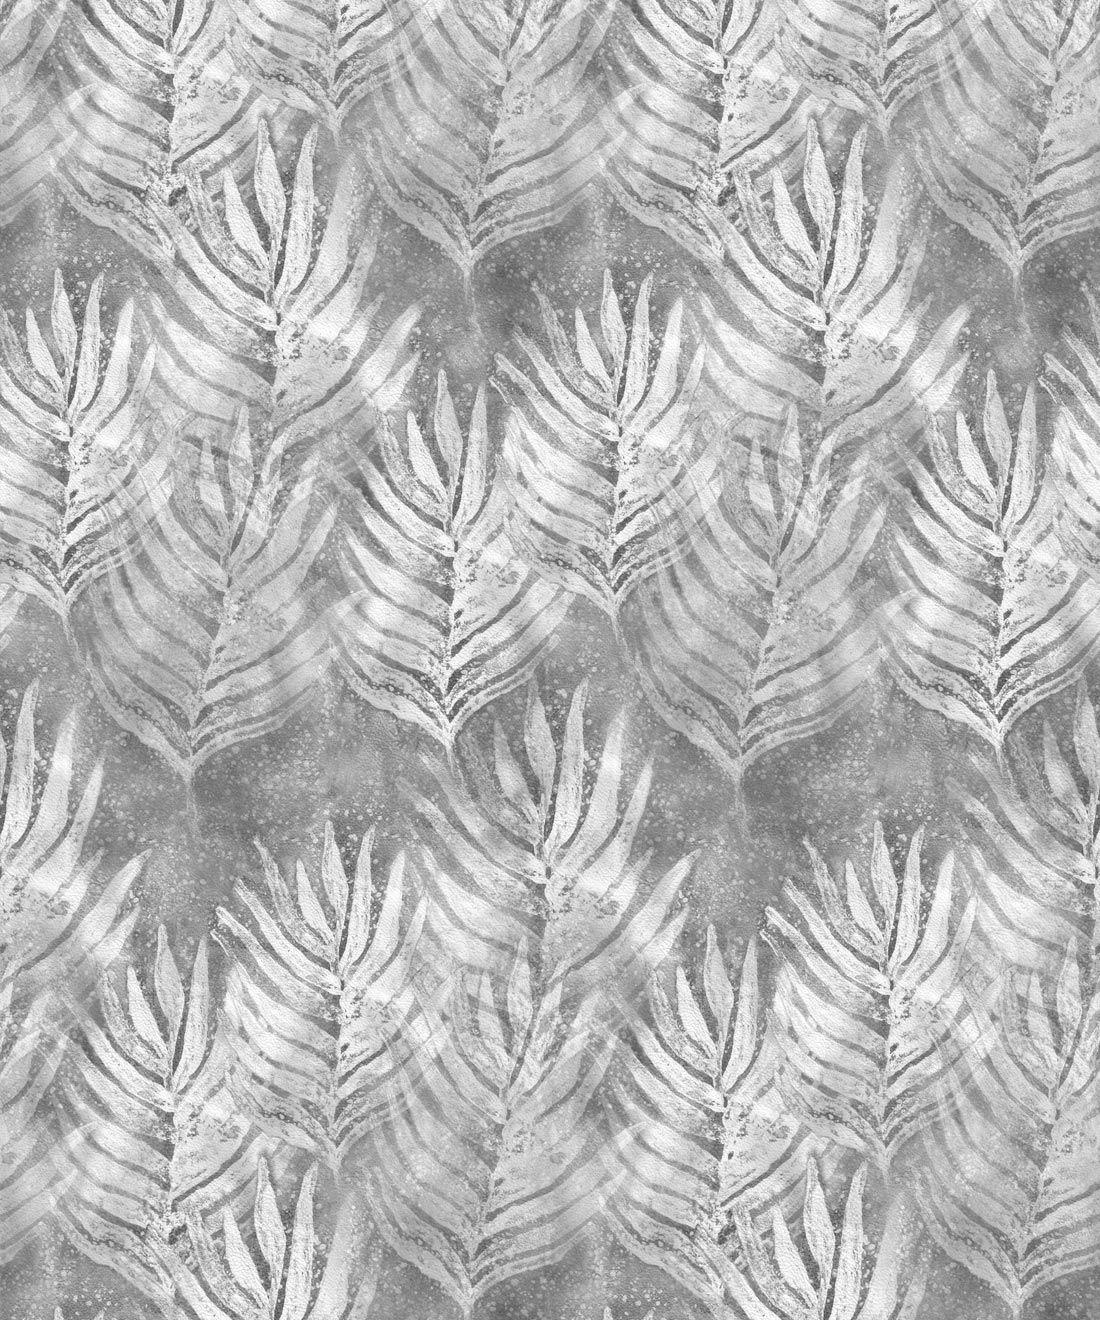 Silver Grey Shibori Leaf Wallpaper